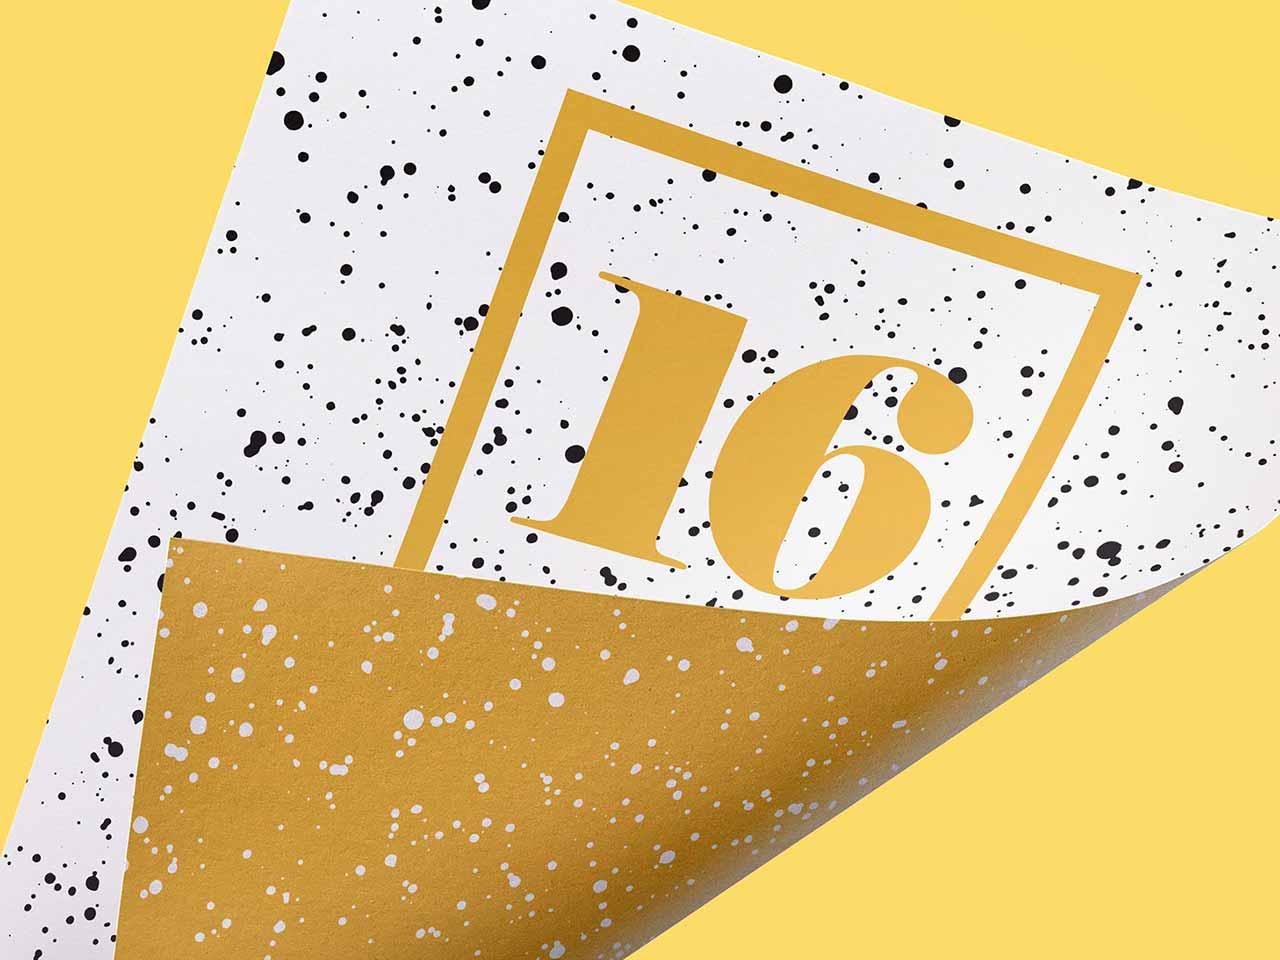 16 Sprayed Vector Textures